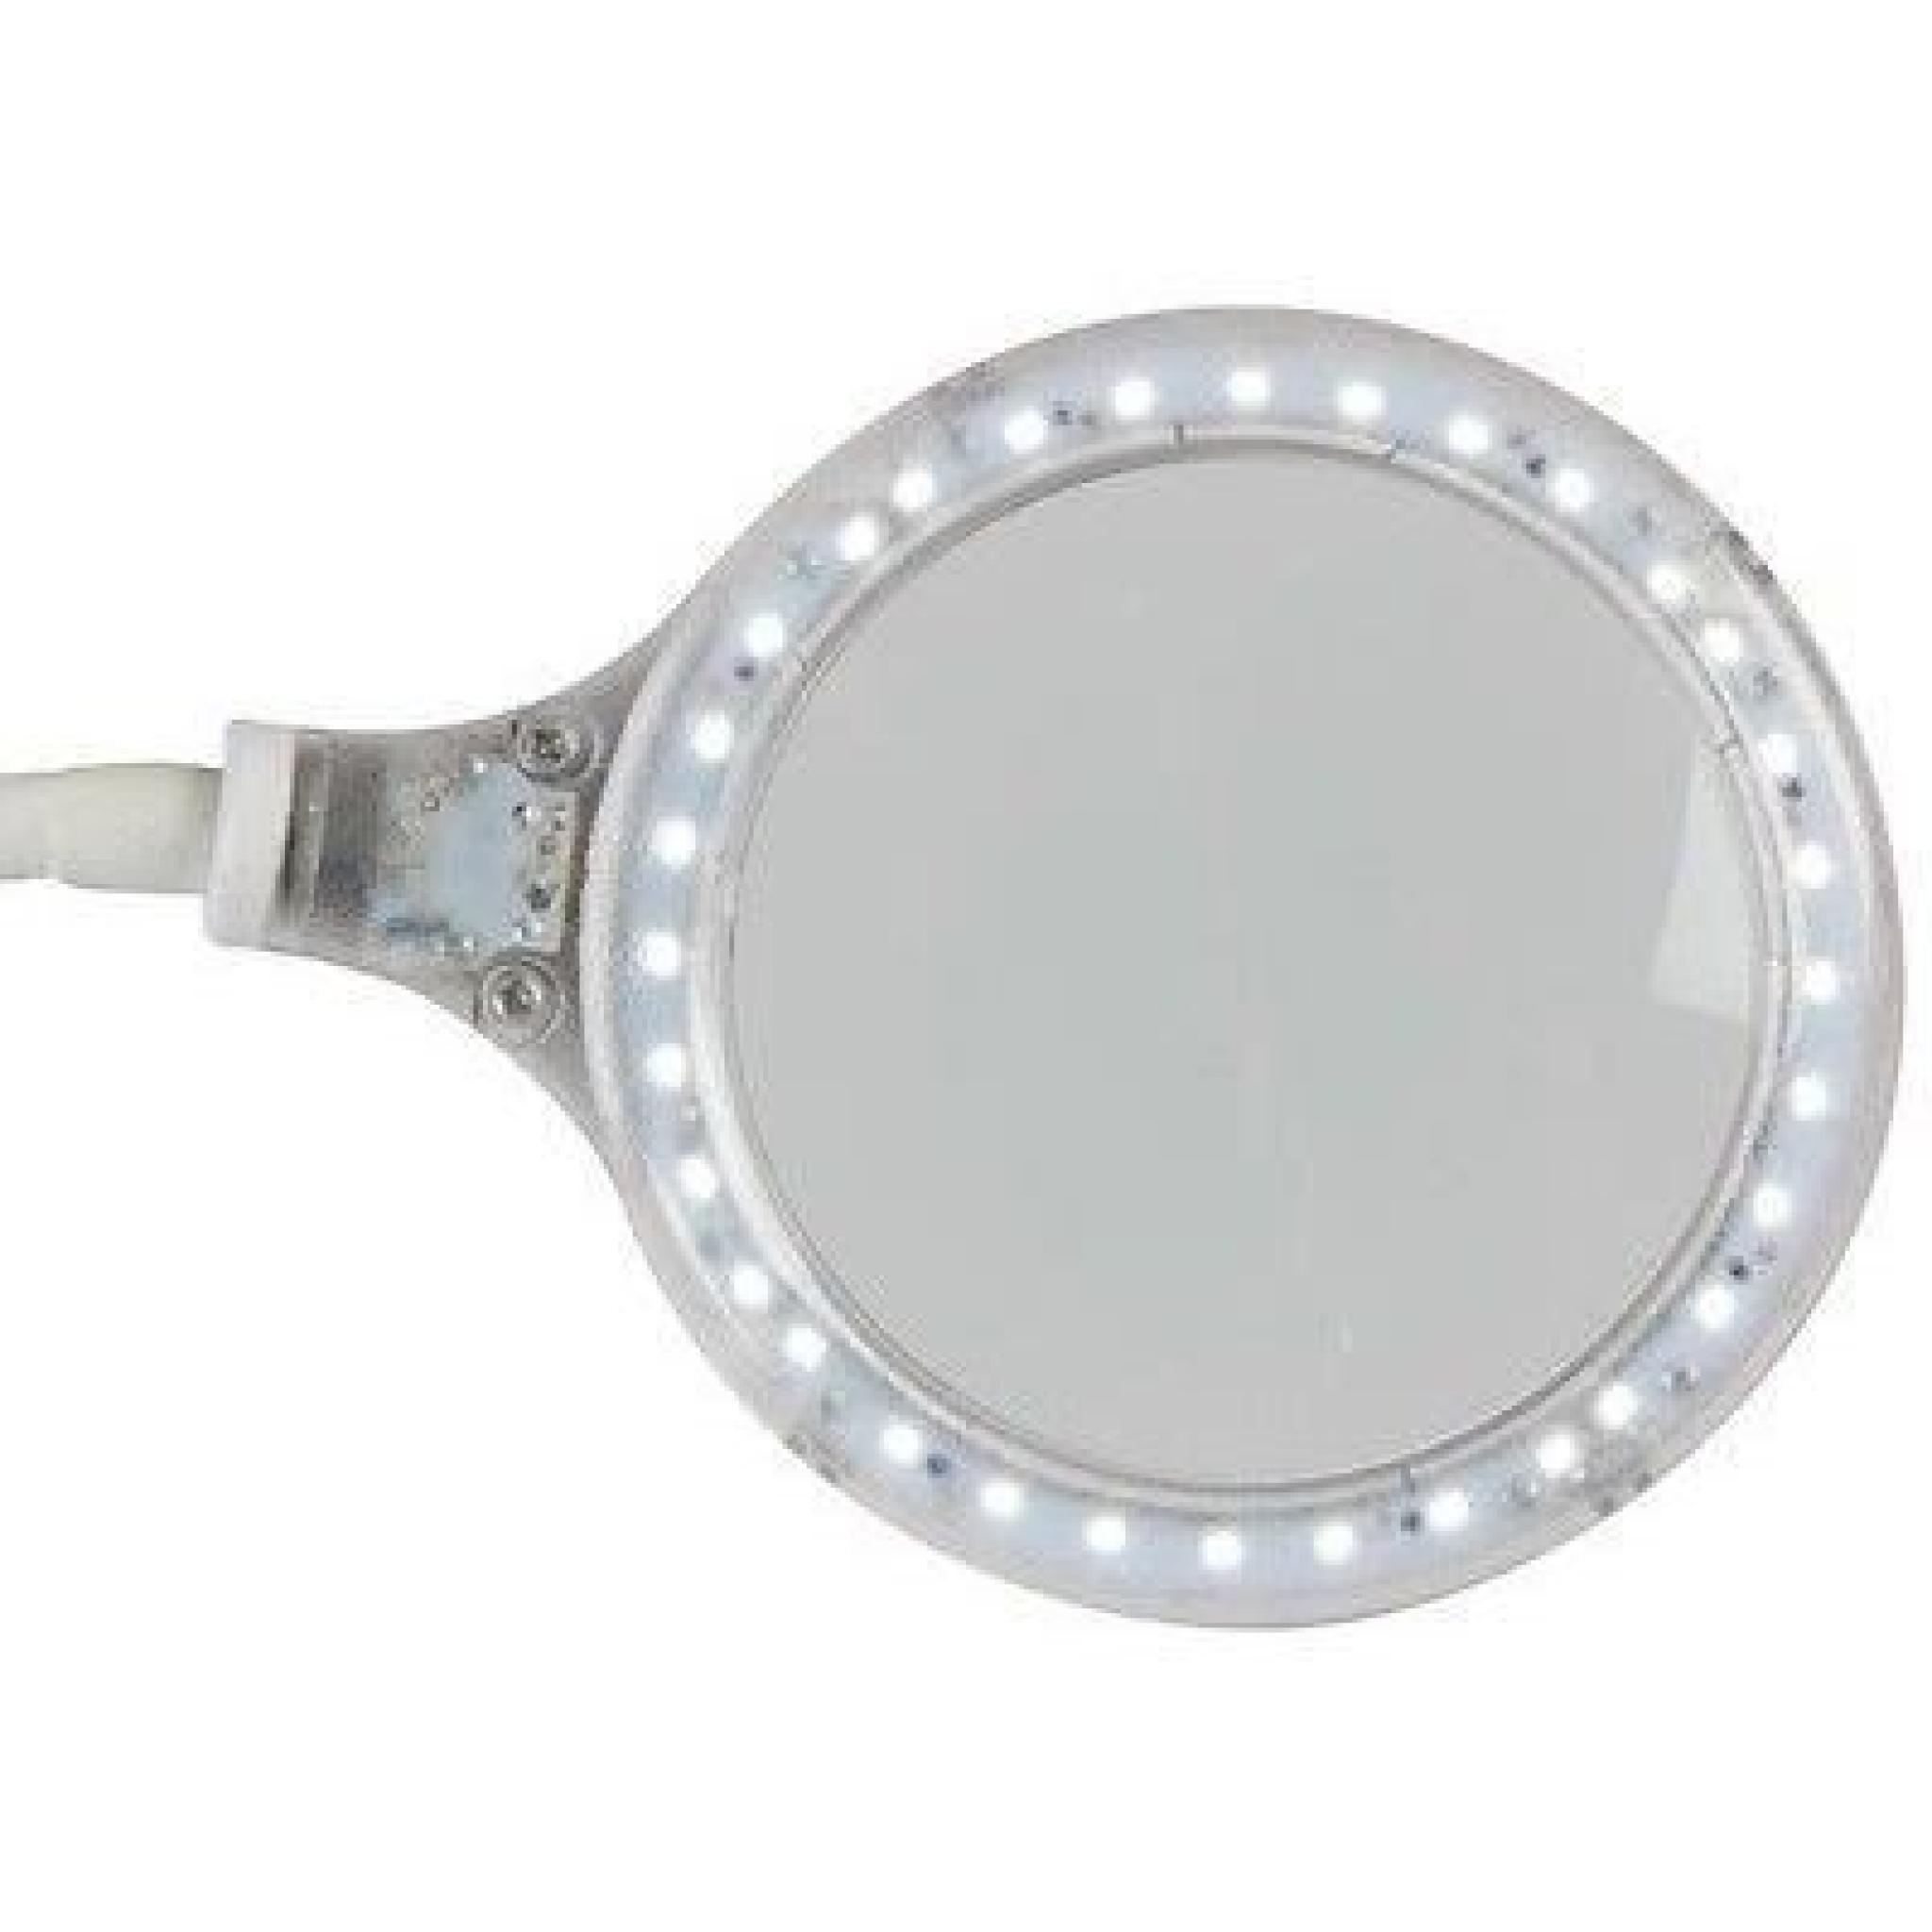 Lampe Led Loupe Lampe Loupe Led Flexible Premium Lampes Bal 2210